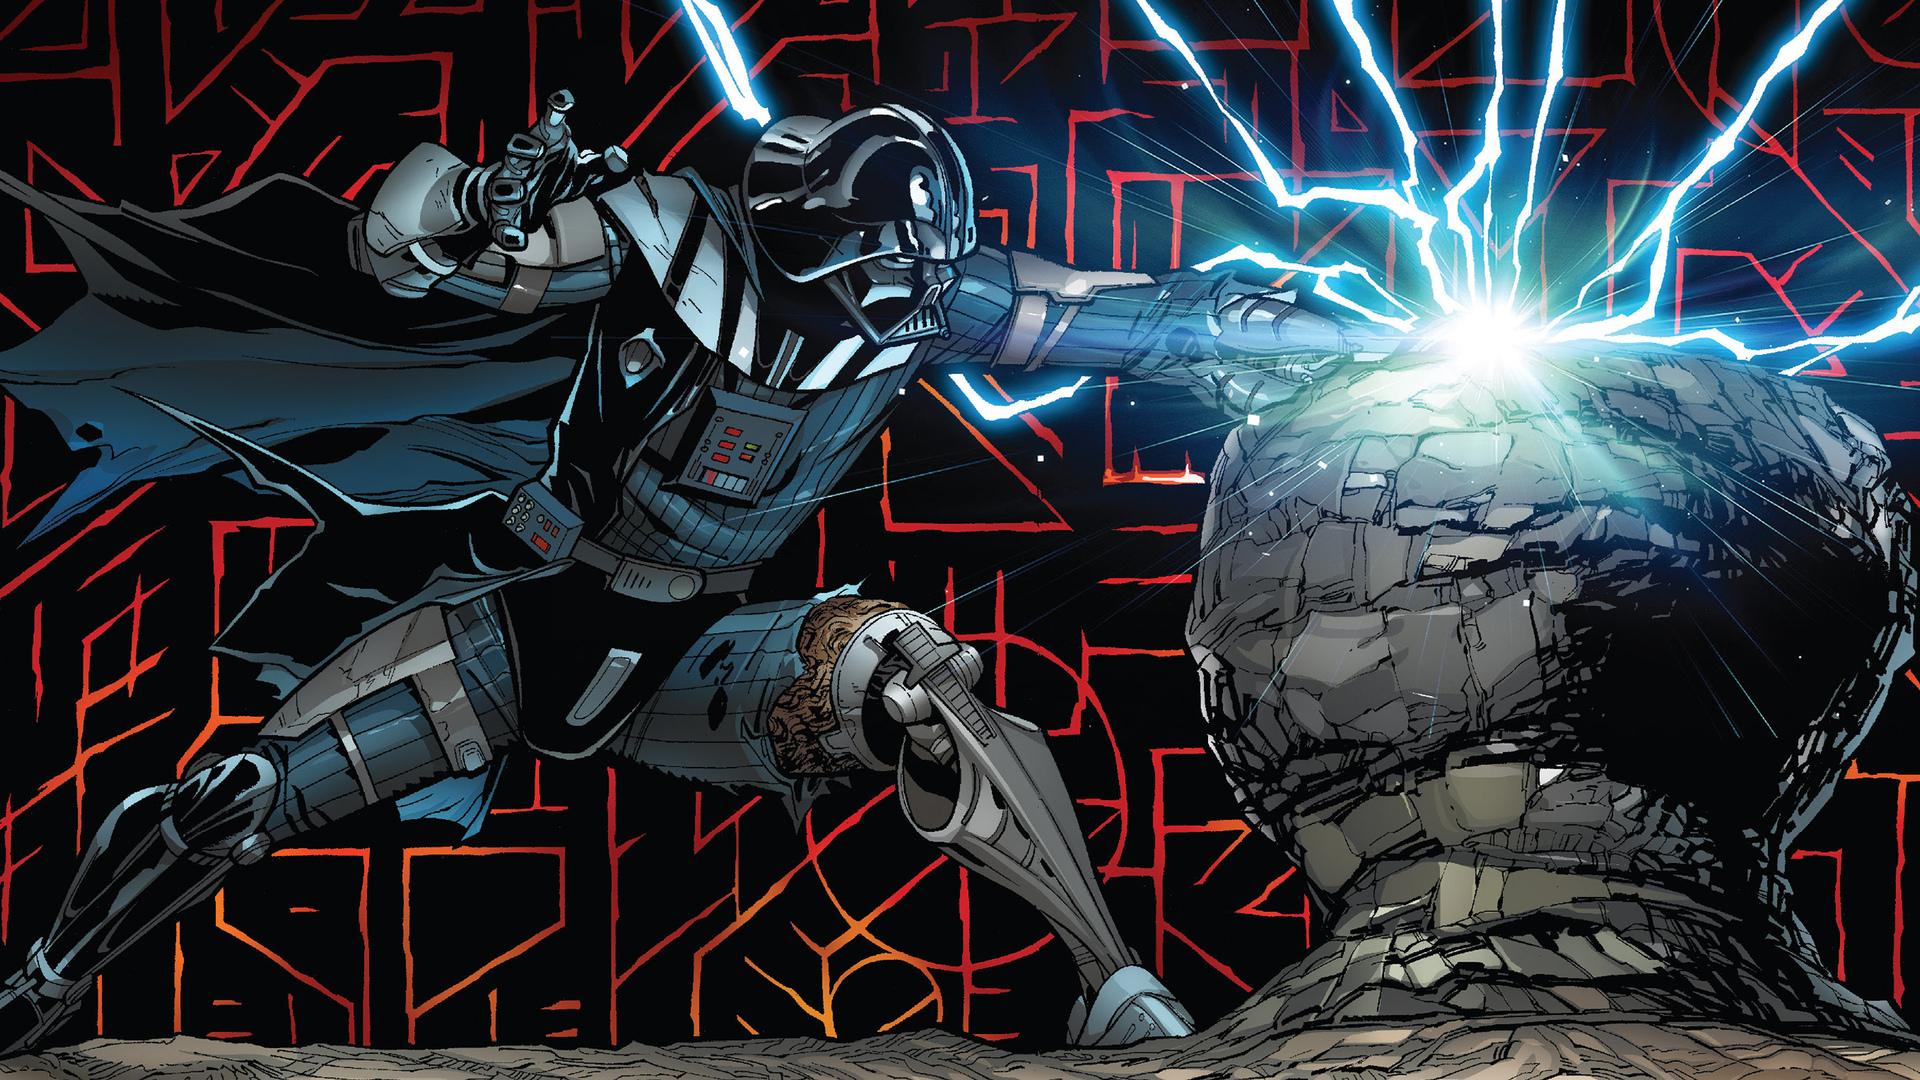 1920x1080 Darth Vader Comic Art Laptop Full HD 1080P HD 4k ...